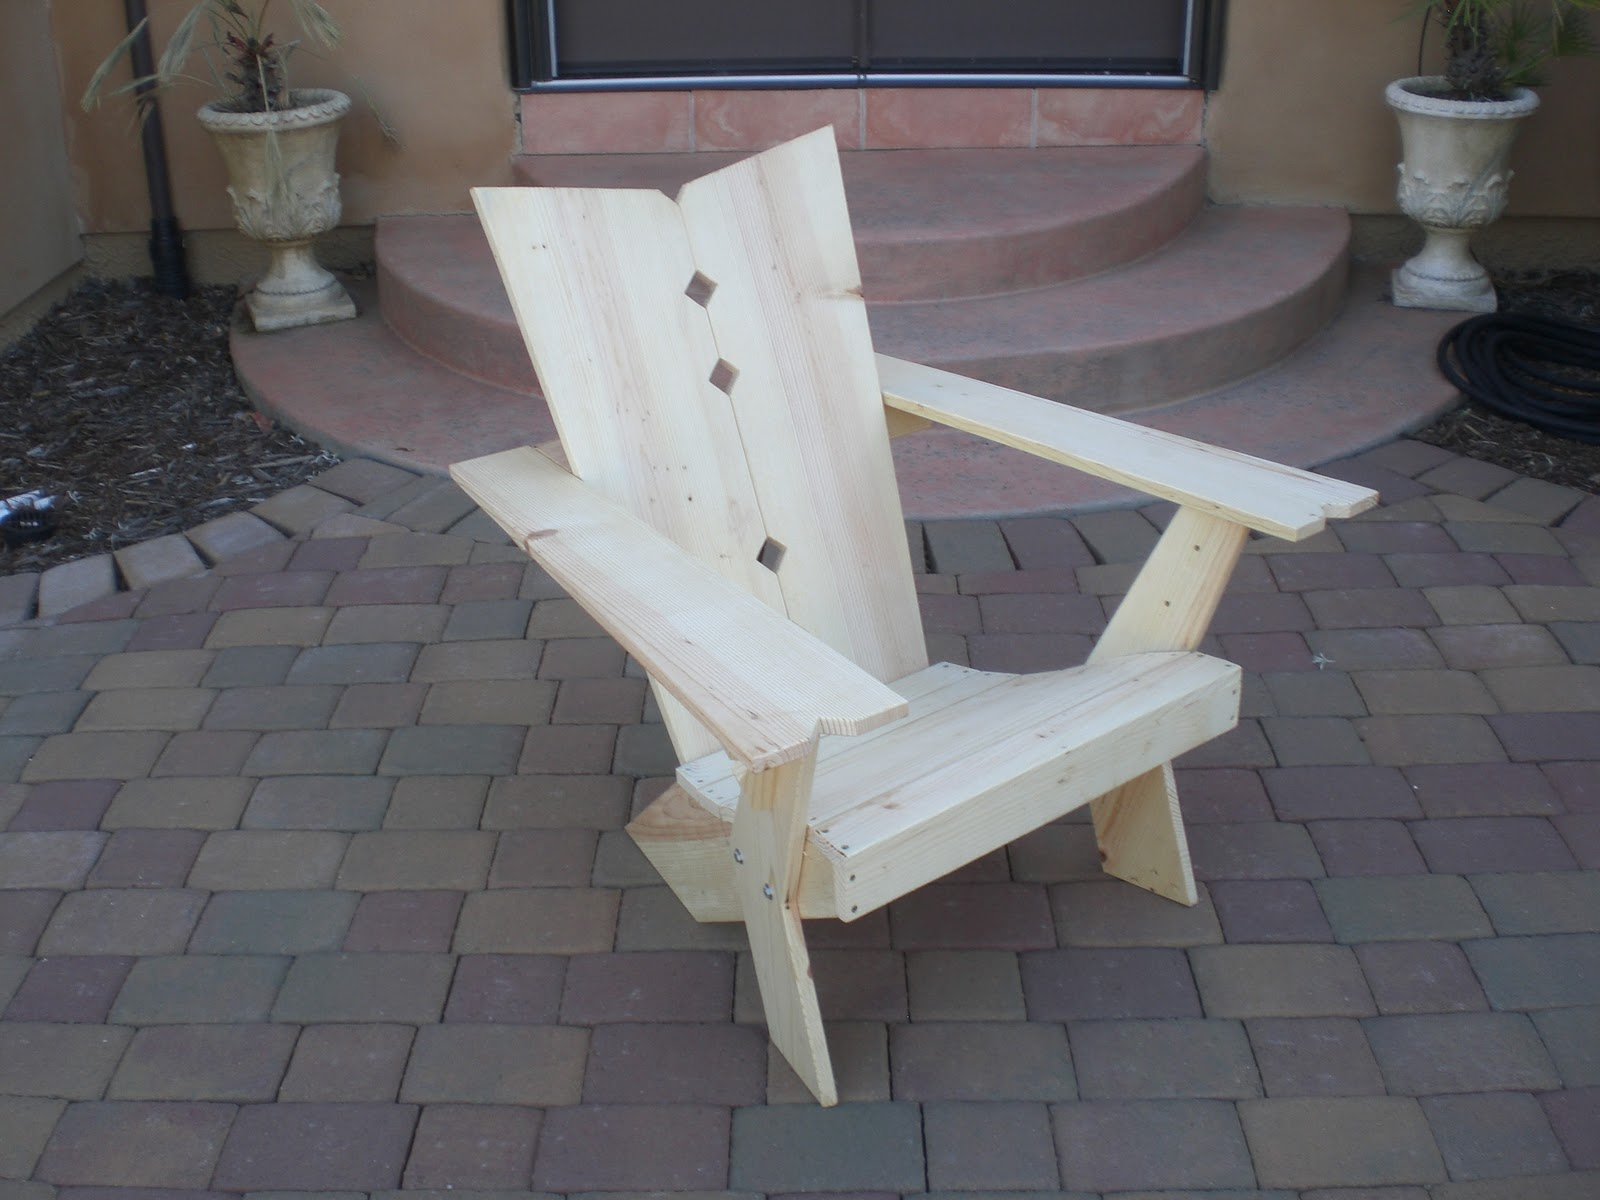 NEW U201cWestport Adirondack Chair   Revised Woodworking Plansu201d